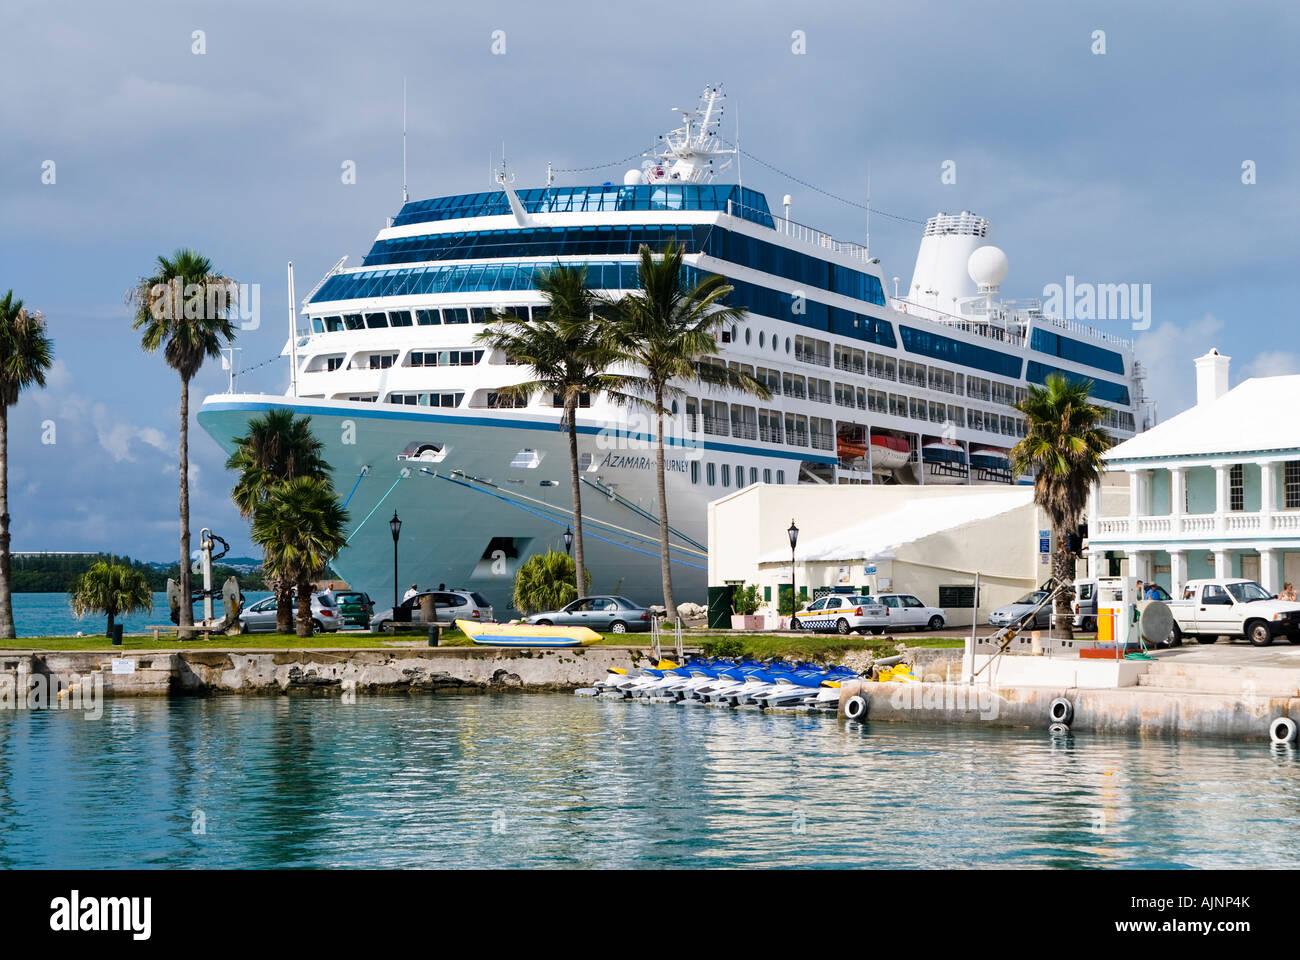 Celebrity cruise ship docked in St George Bermuda - Stock Image